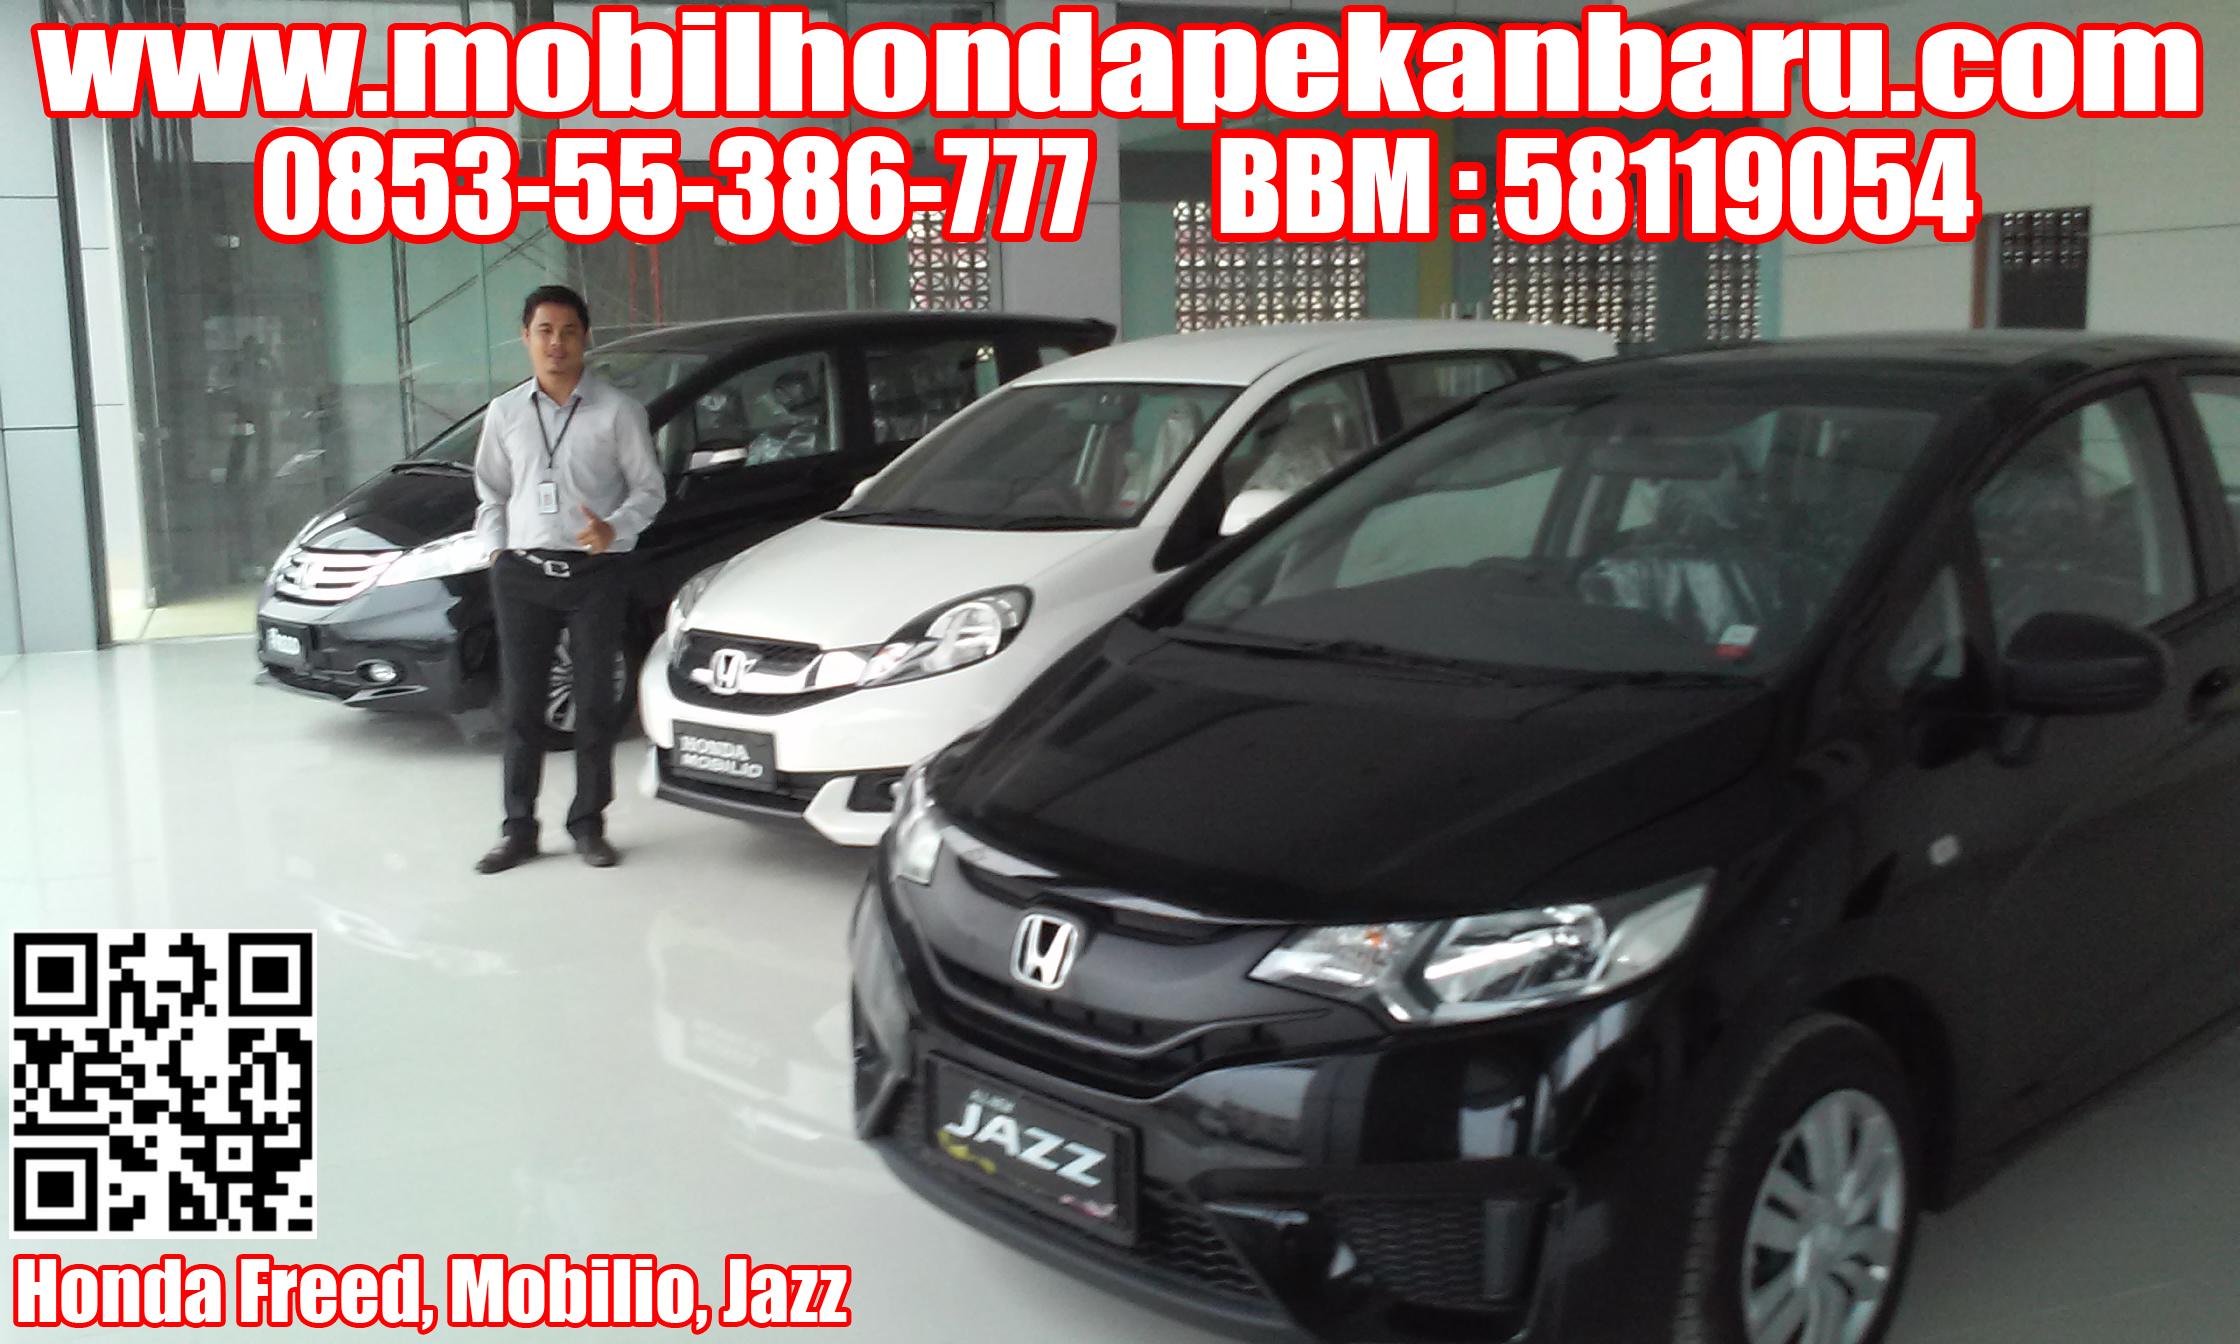 Harga Honda Accord Pekanbaru | New Honda Release 2017/2018